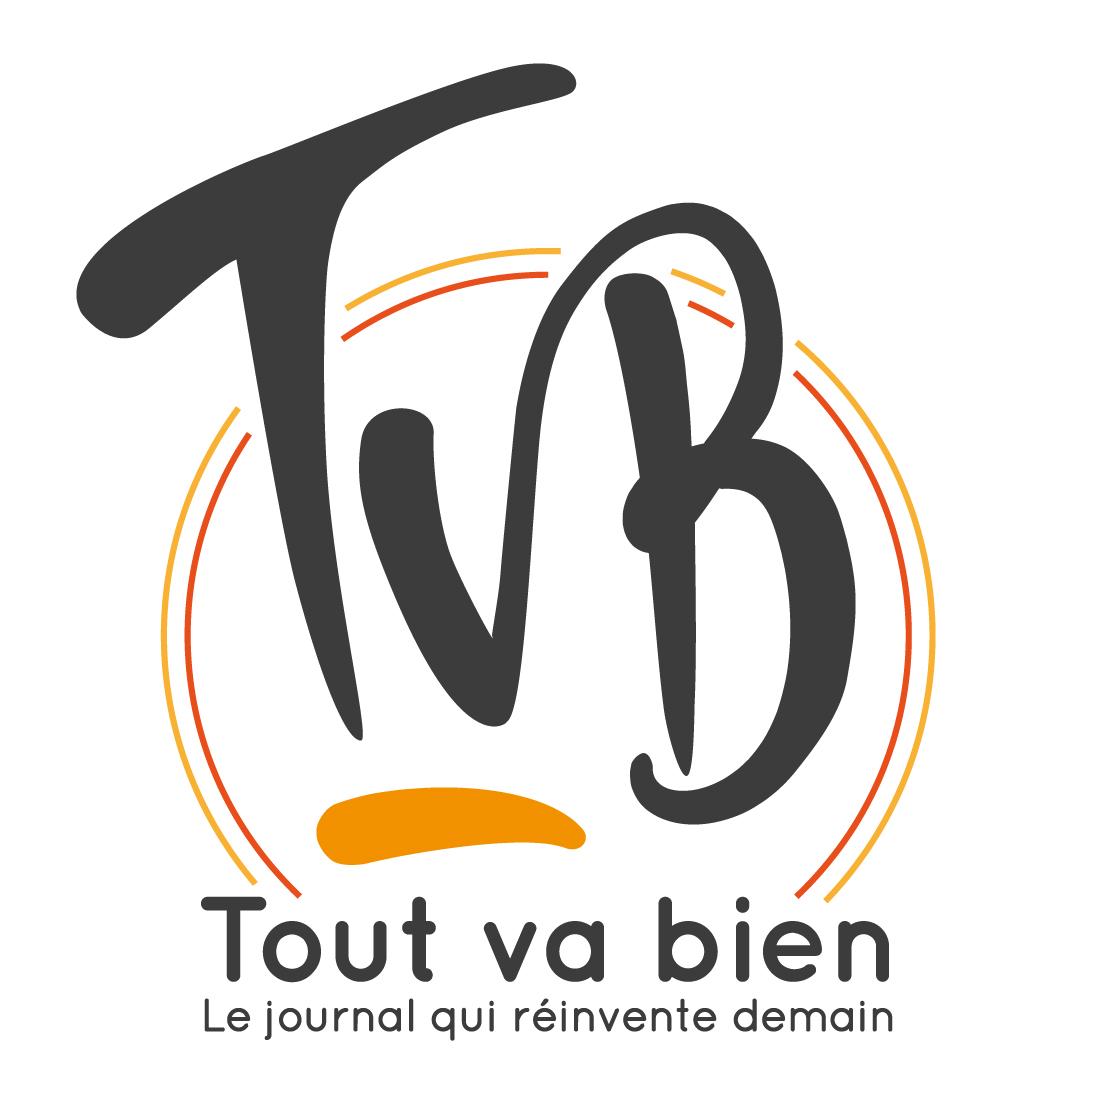 Tvb baseline 3 02